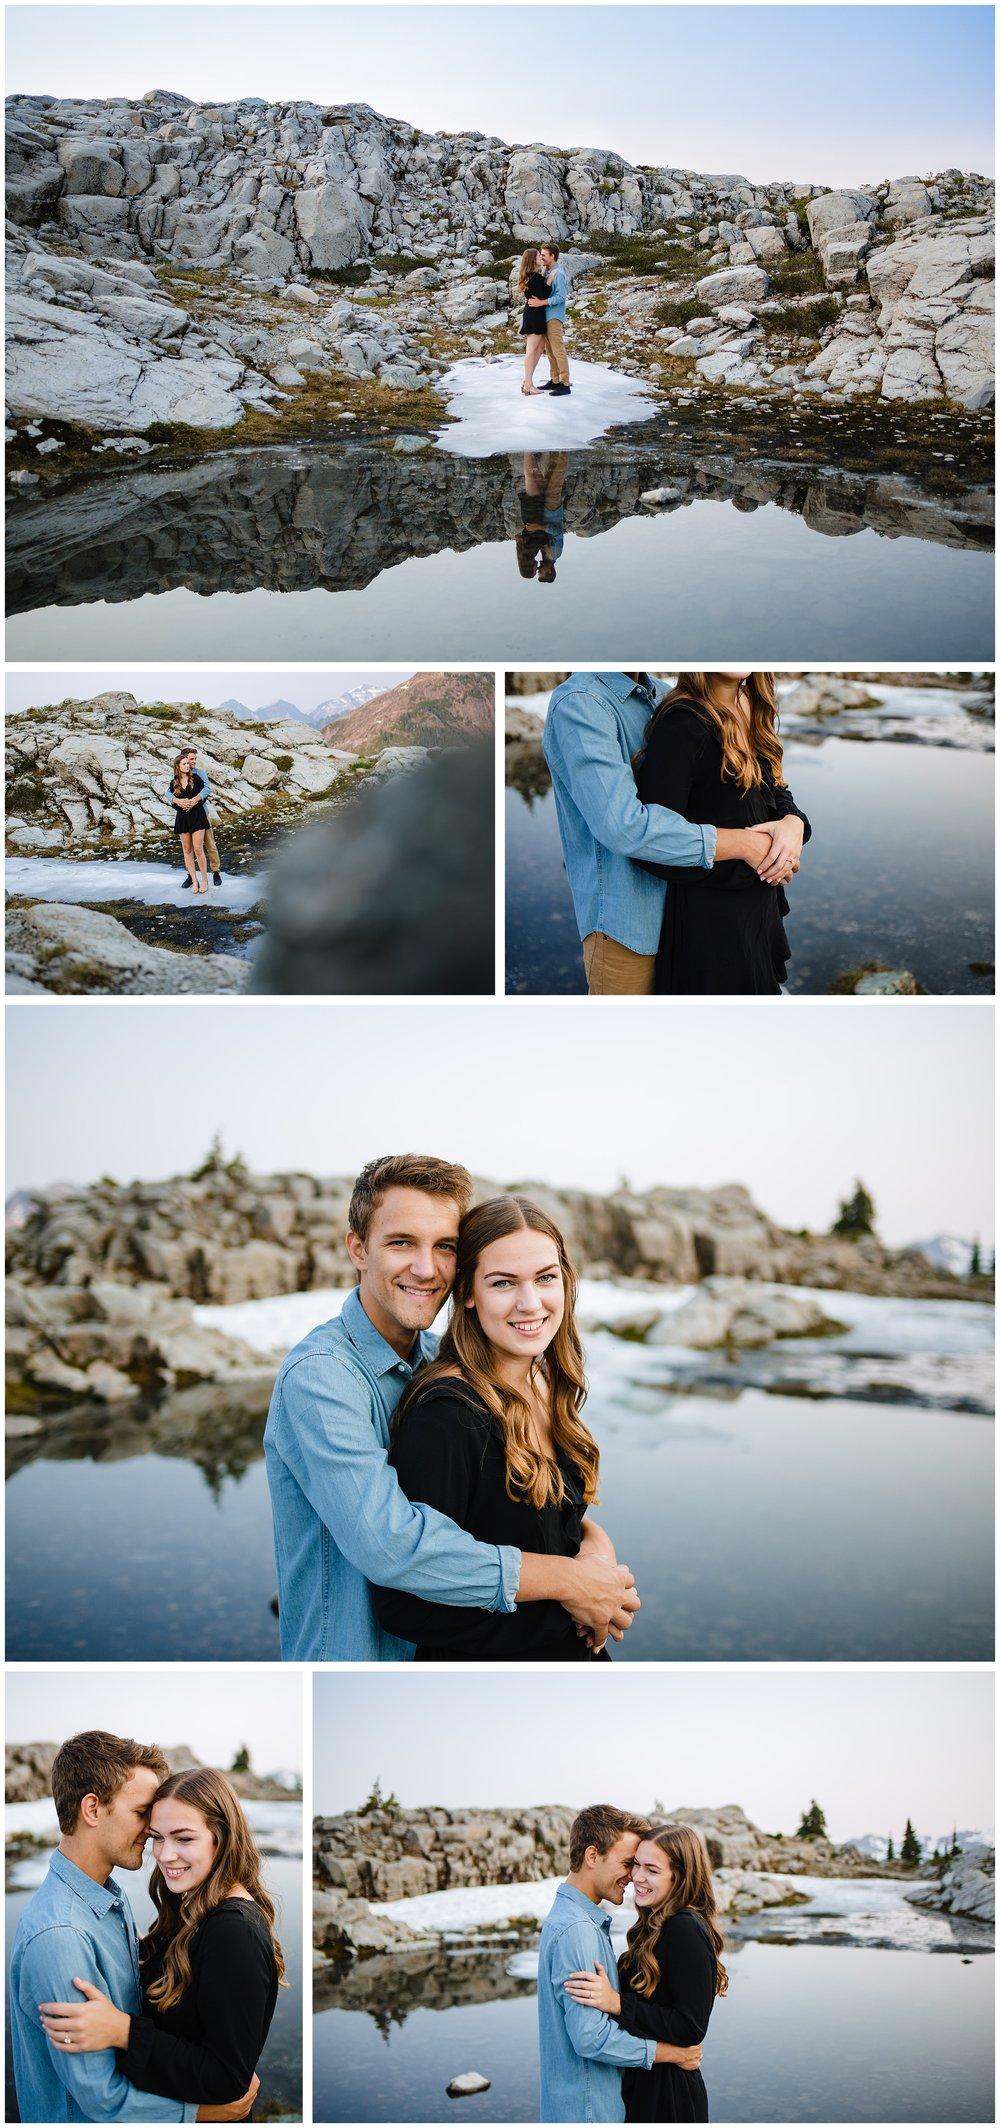 Mt Baker Artist Point Engagement Photography Mountain Inspo Couples Photographer Evening Romantic_0003.jpg